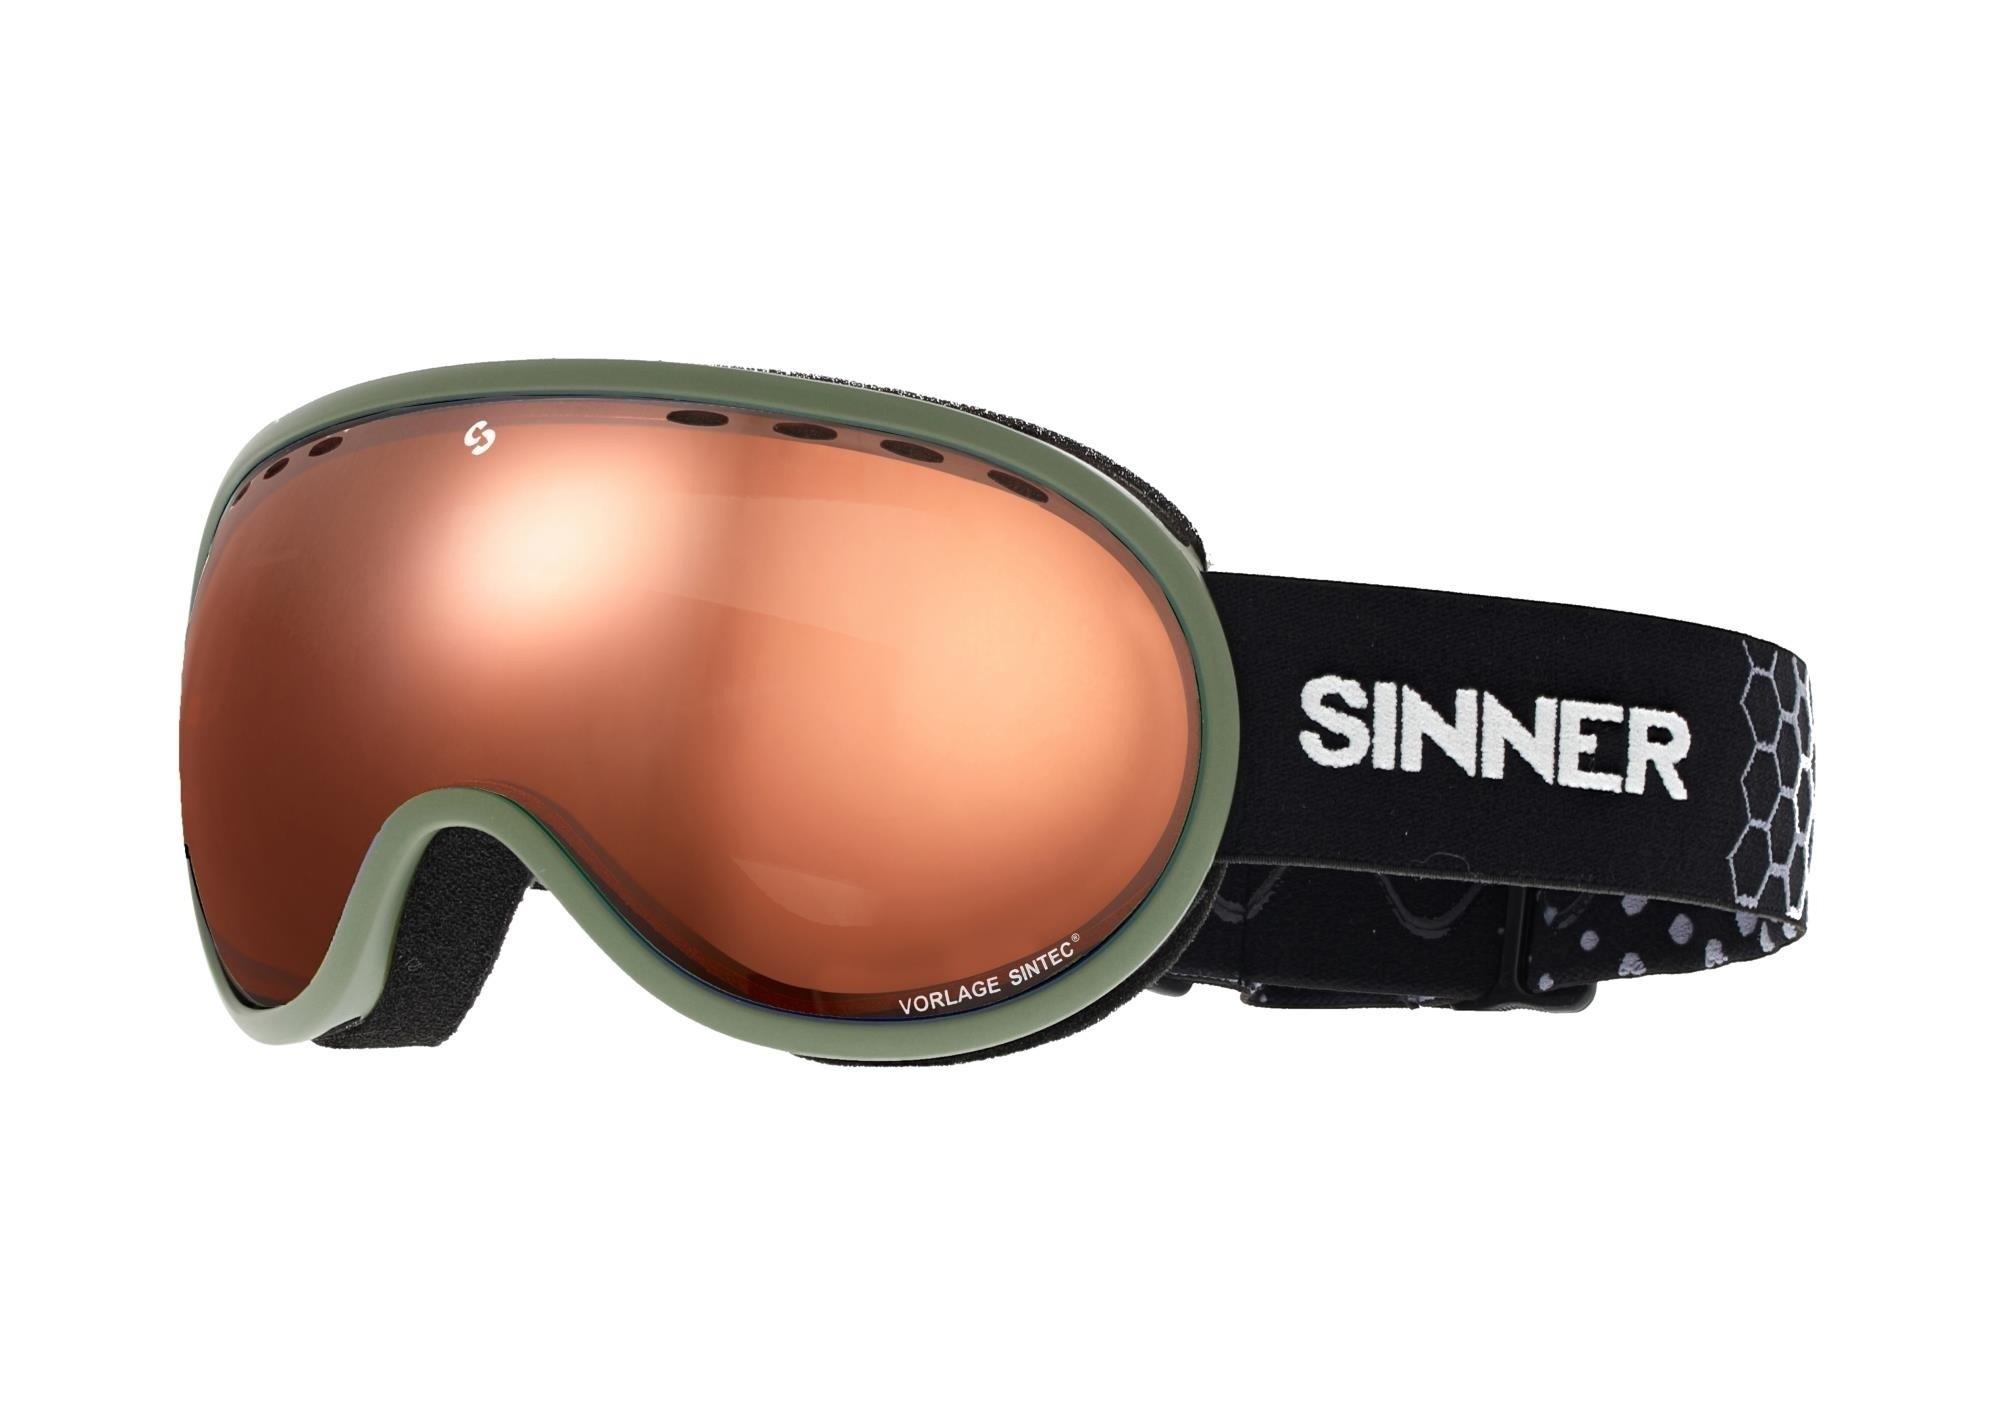 Snowboardbril Sinner Vorlage